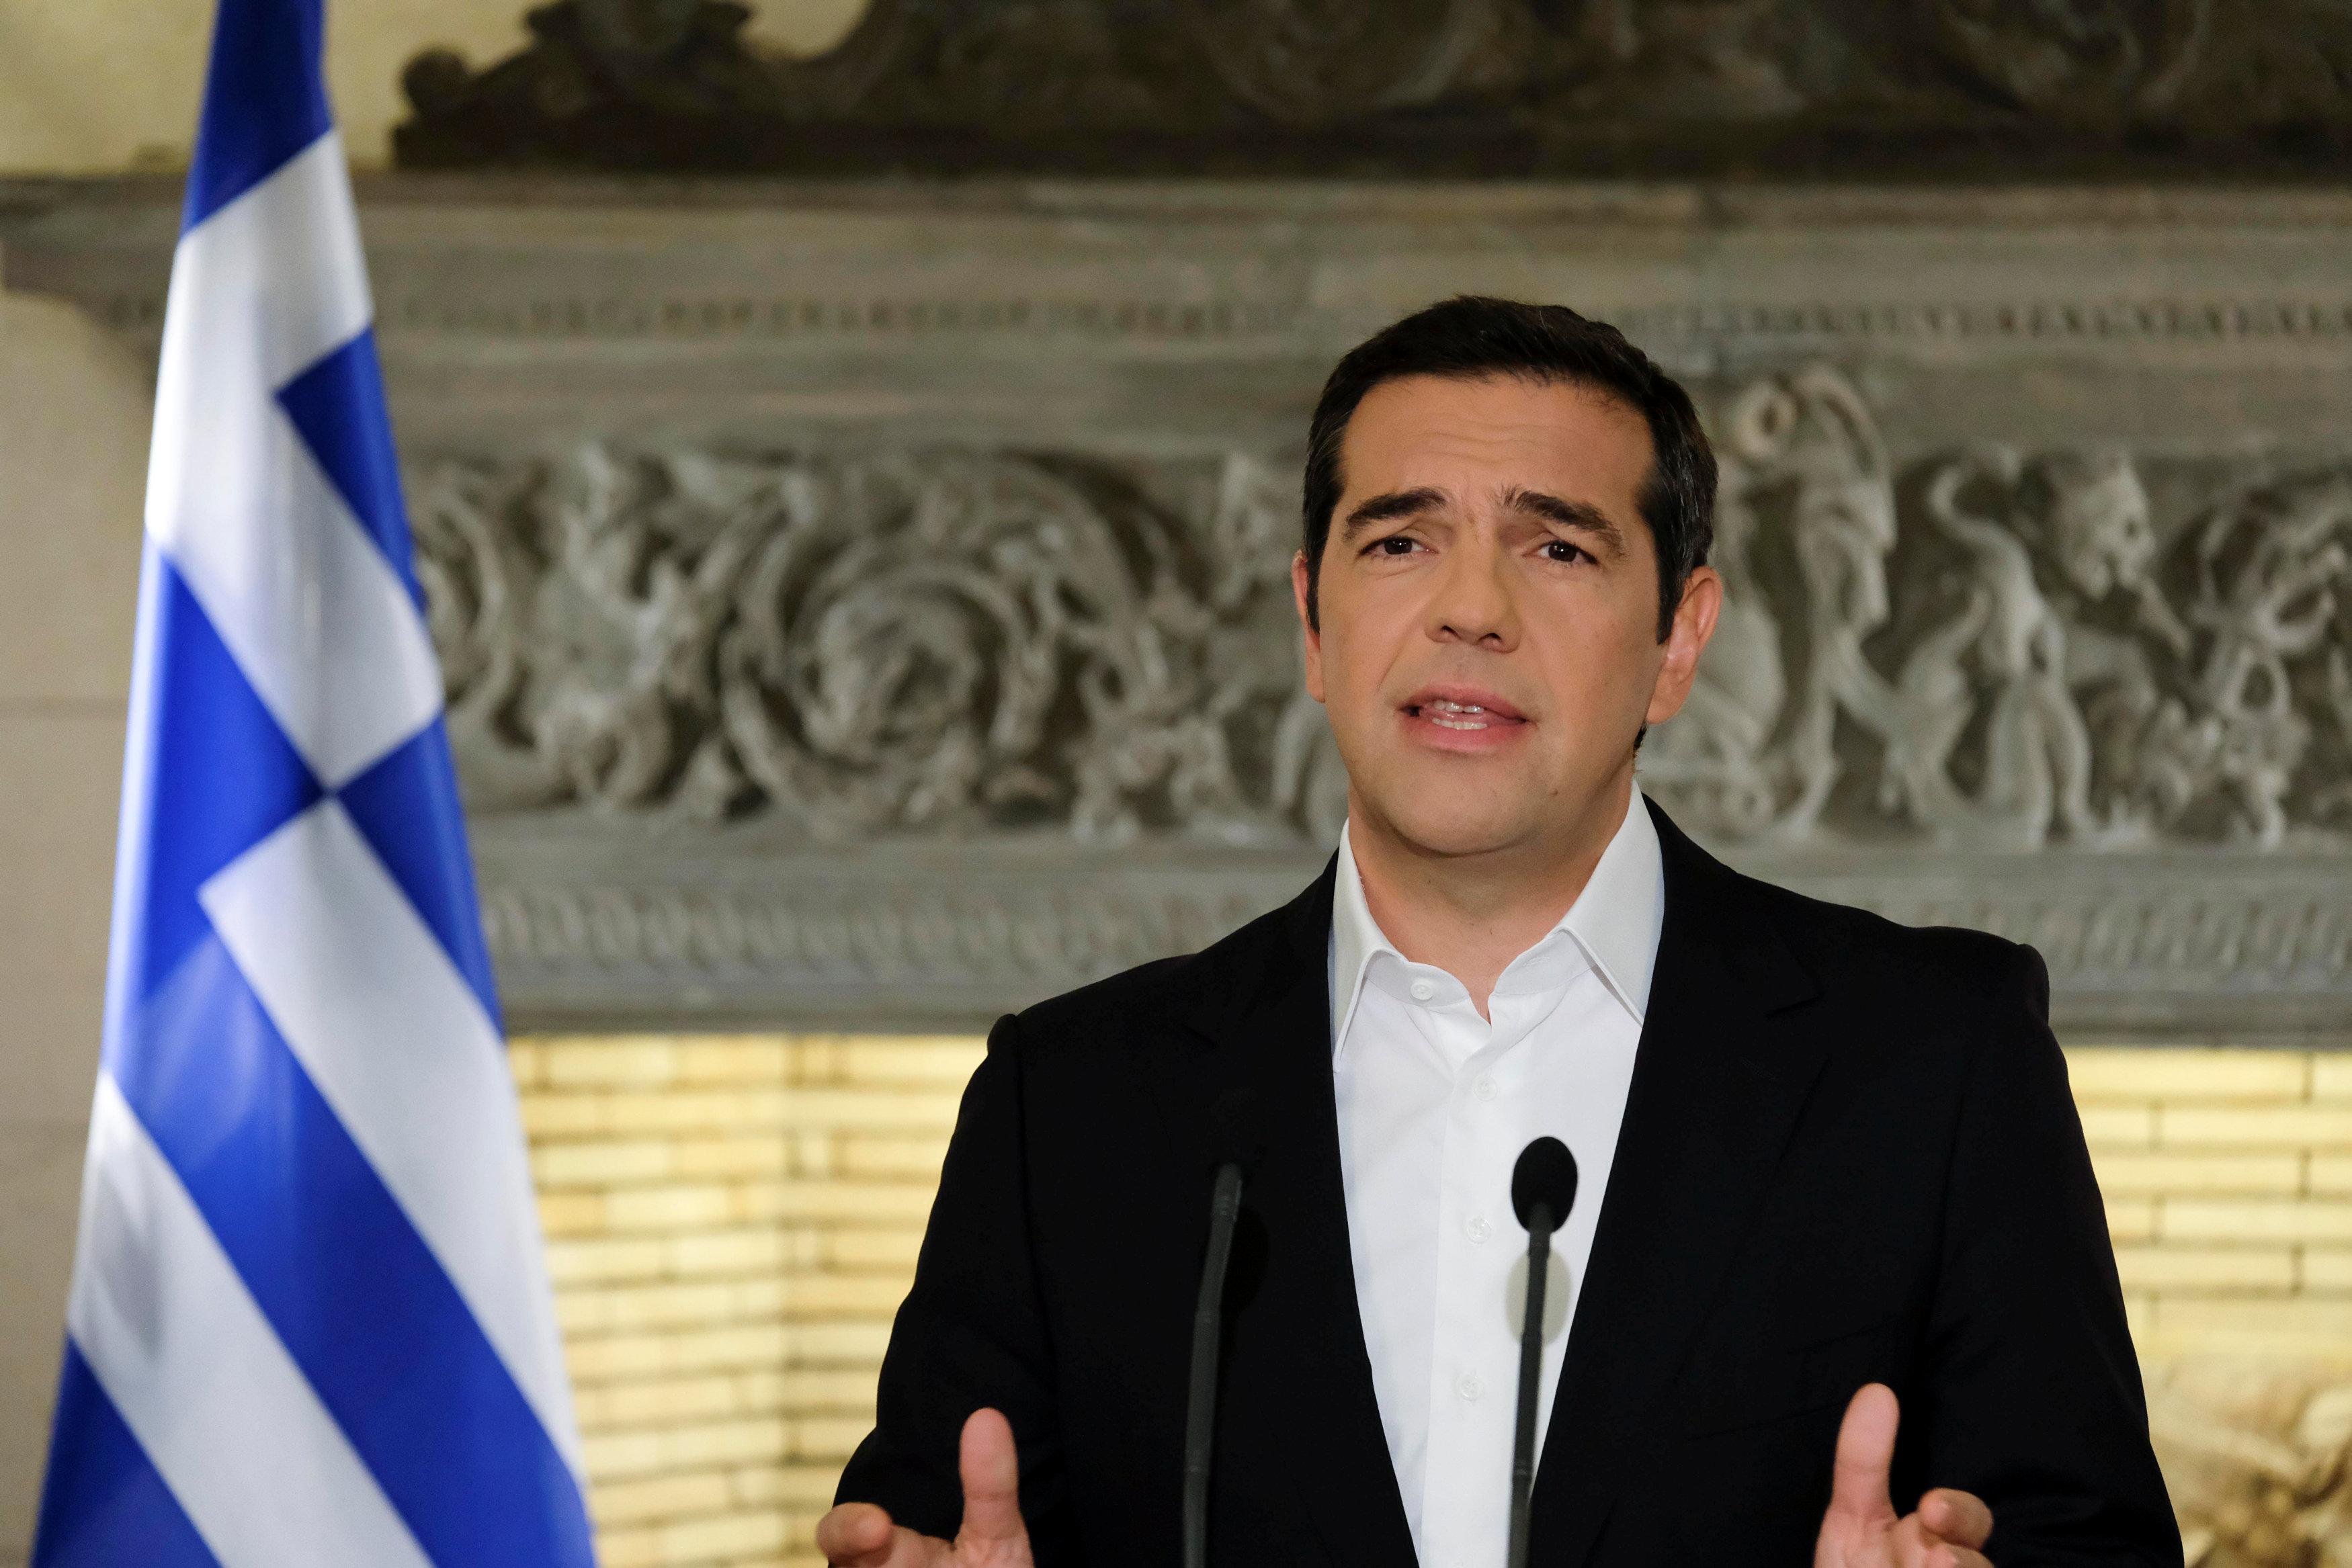 Greek premier faces backlash over Macedonia name deal